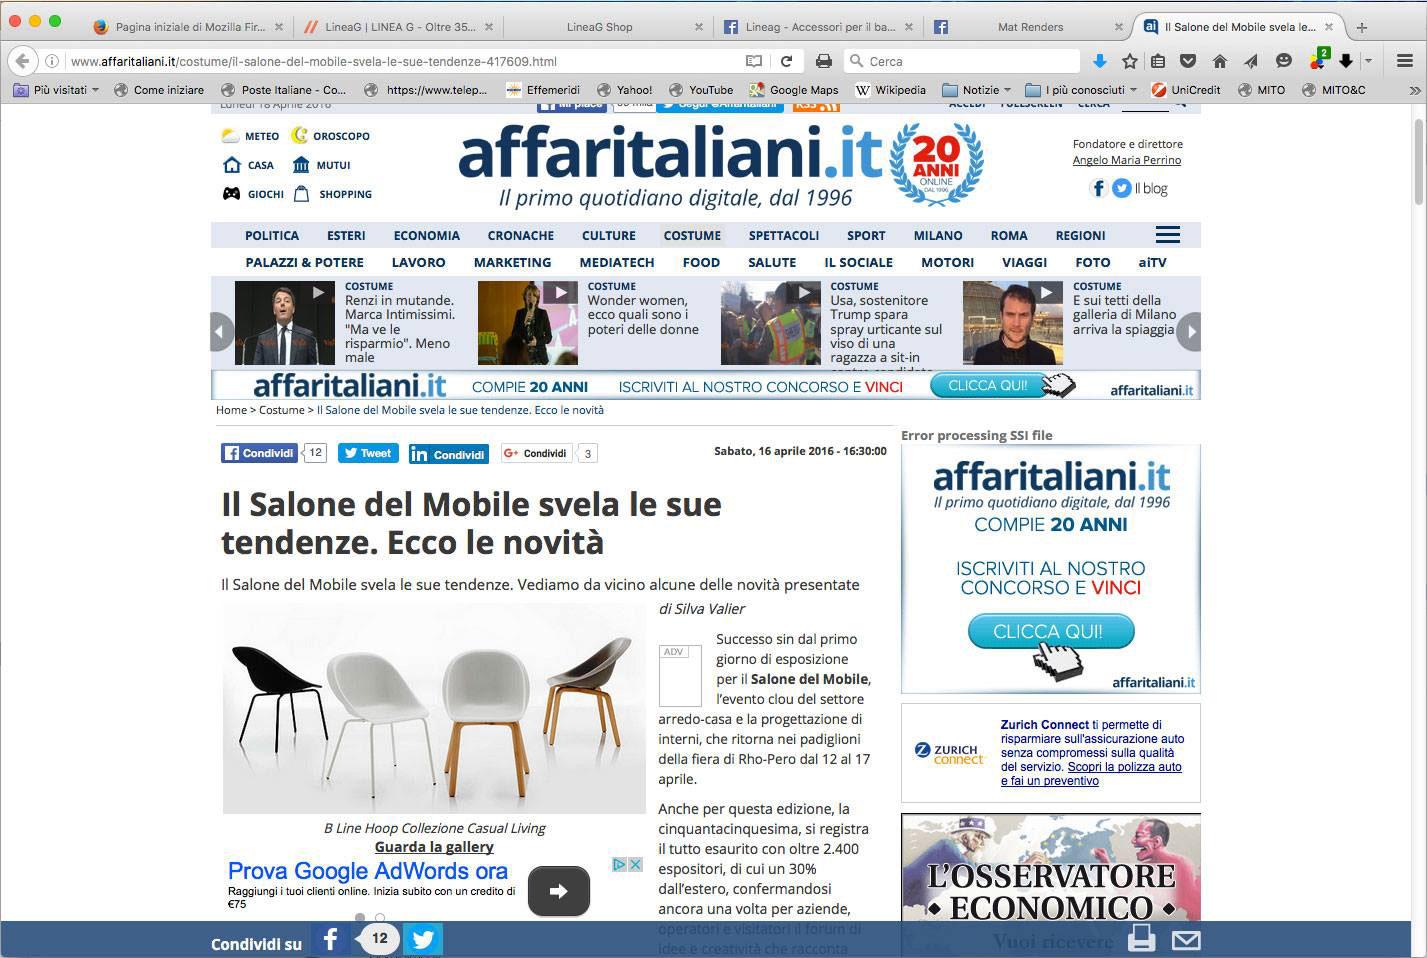 Affariitaliani_16.04